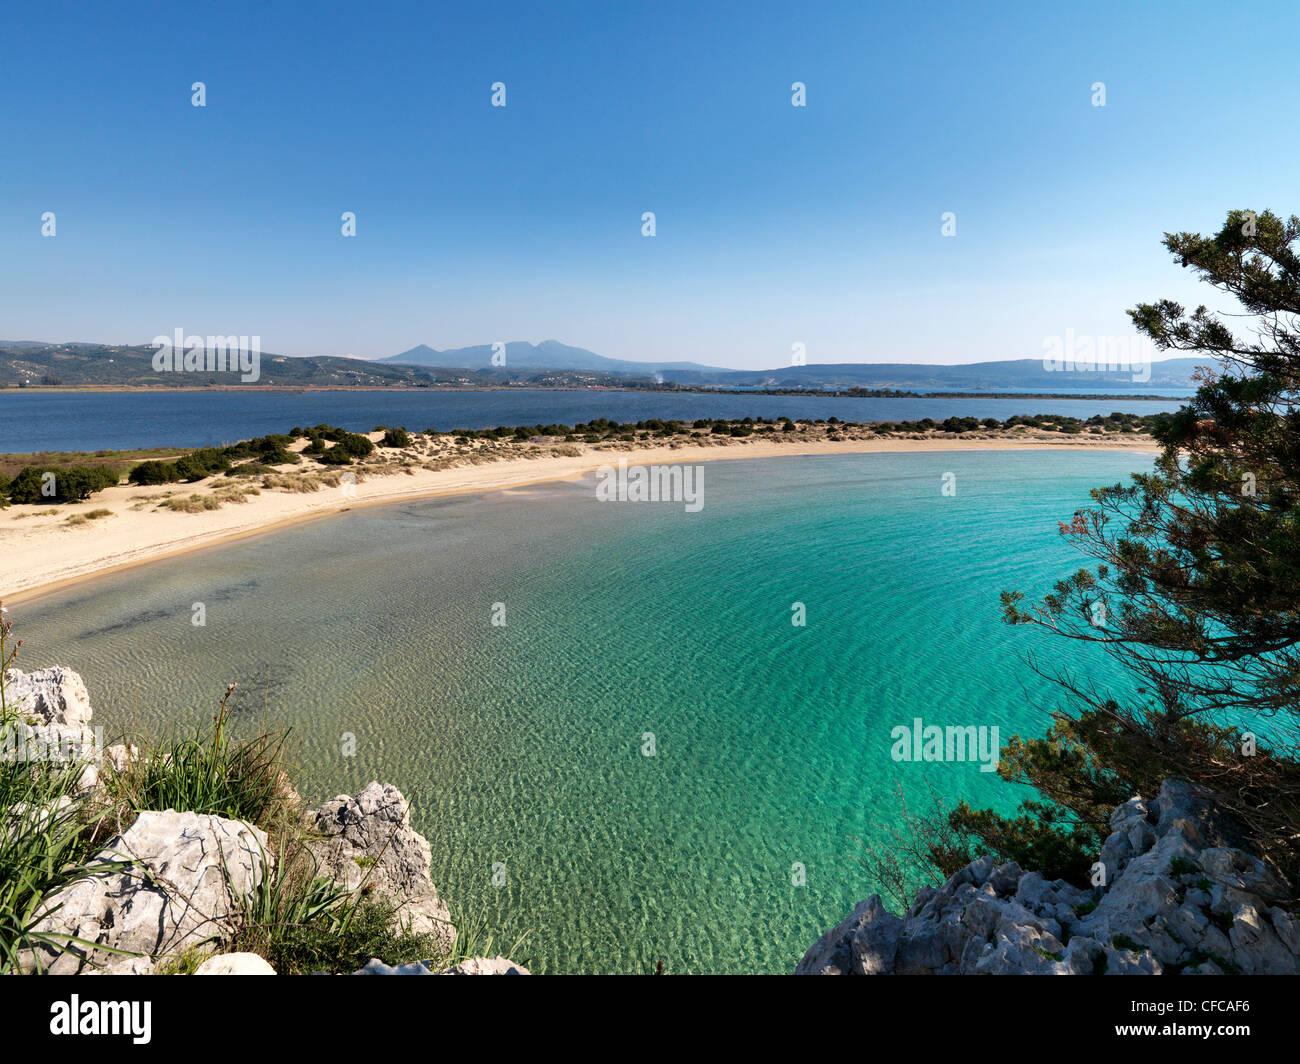 Bay of Navarino, Pylos, Peloponnes, Greece - Stock Image